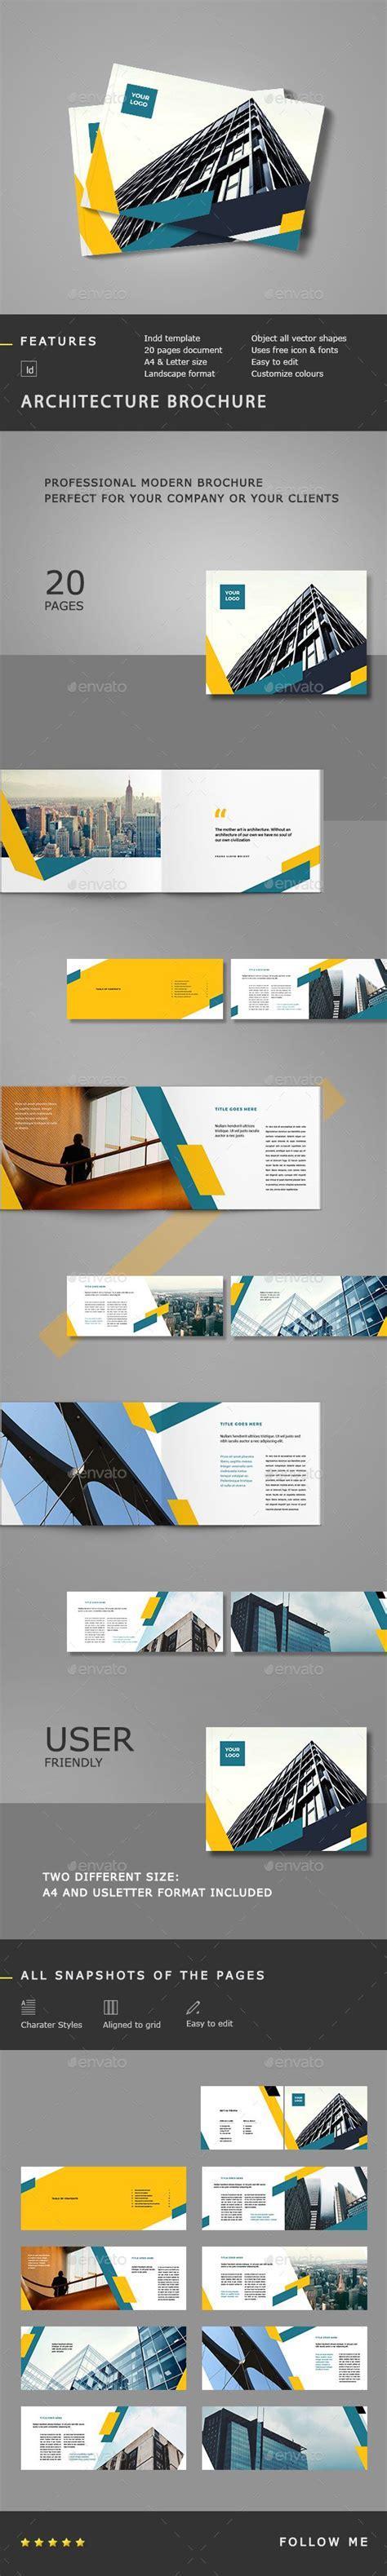 landscape layout in indesign 95 best images about brochure inspiration on pinterest